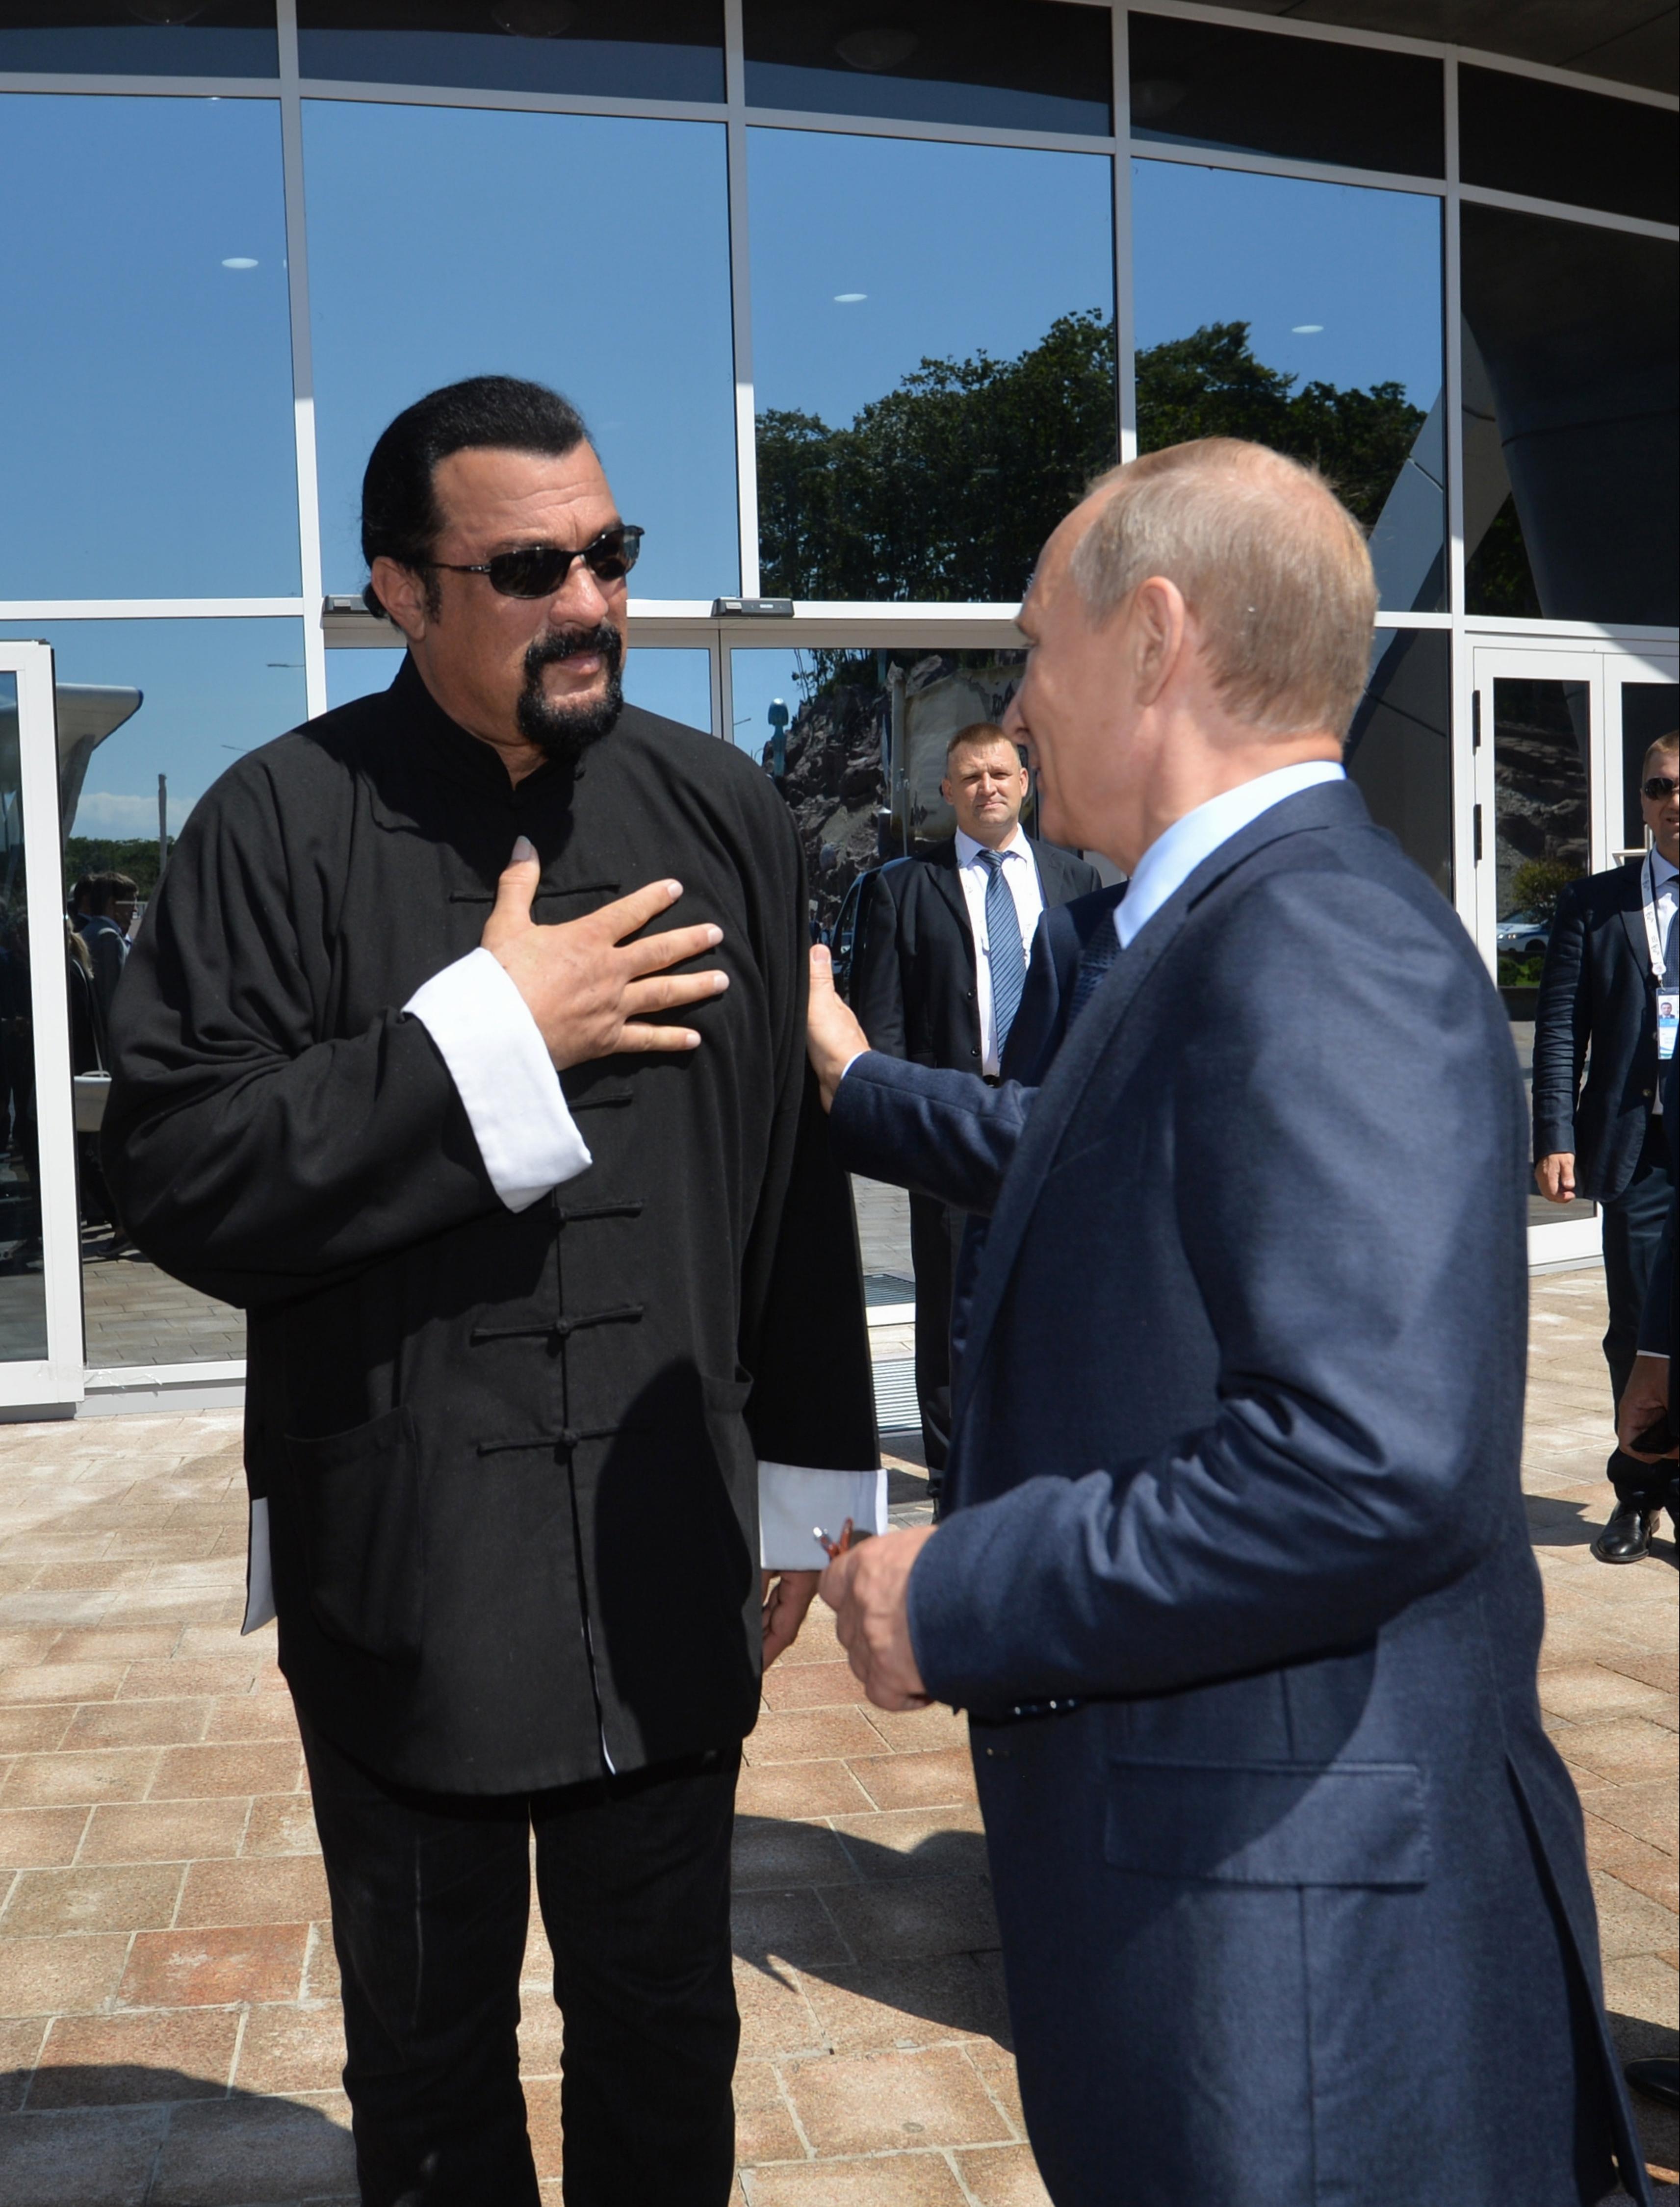 Steven Seagal and Vladimir Putin share a warm moment